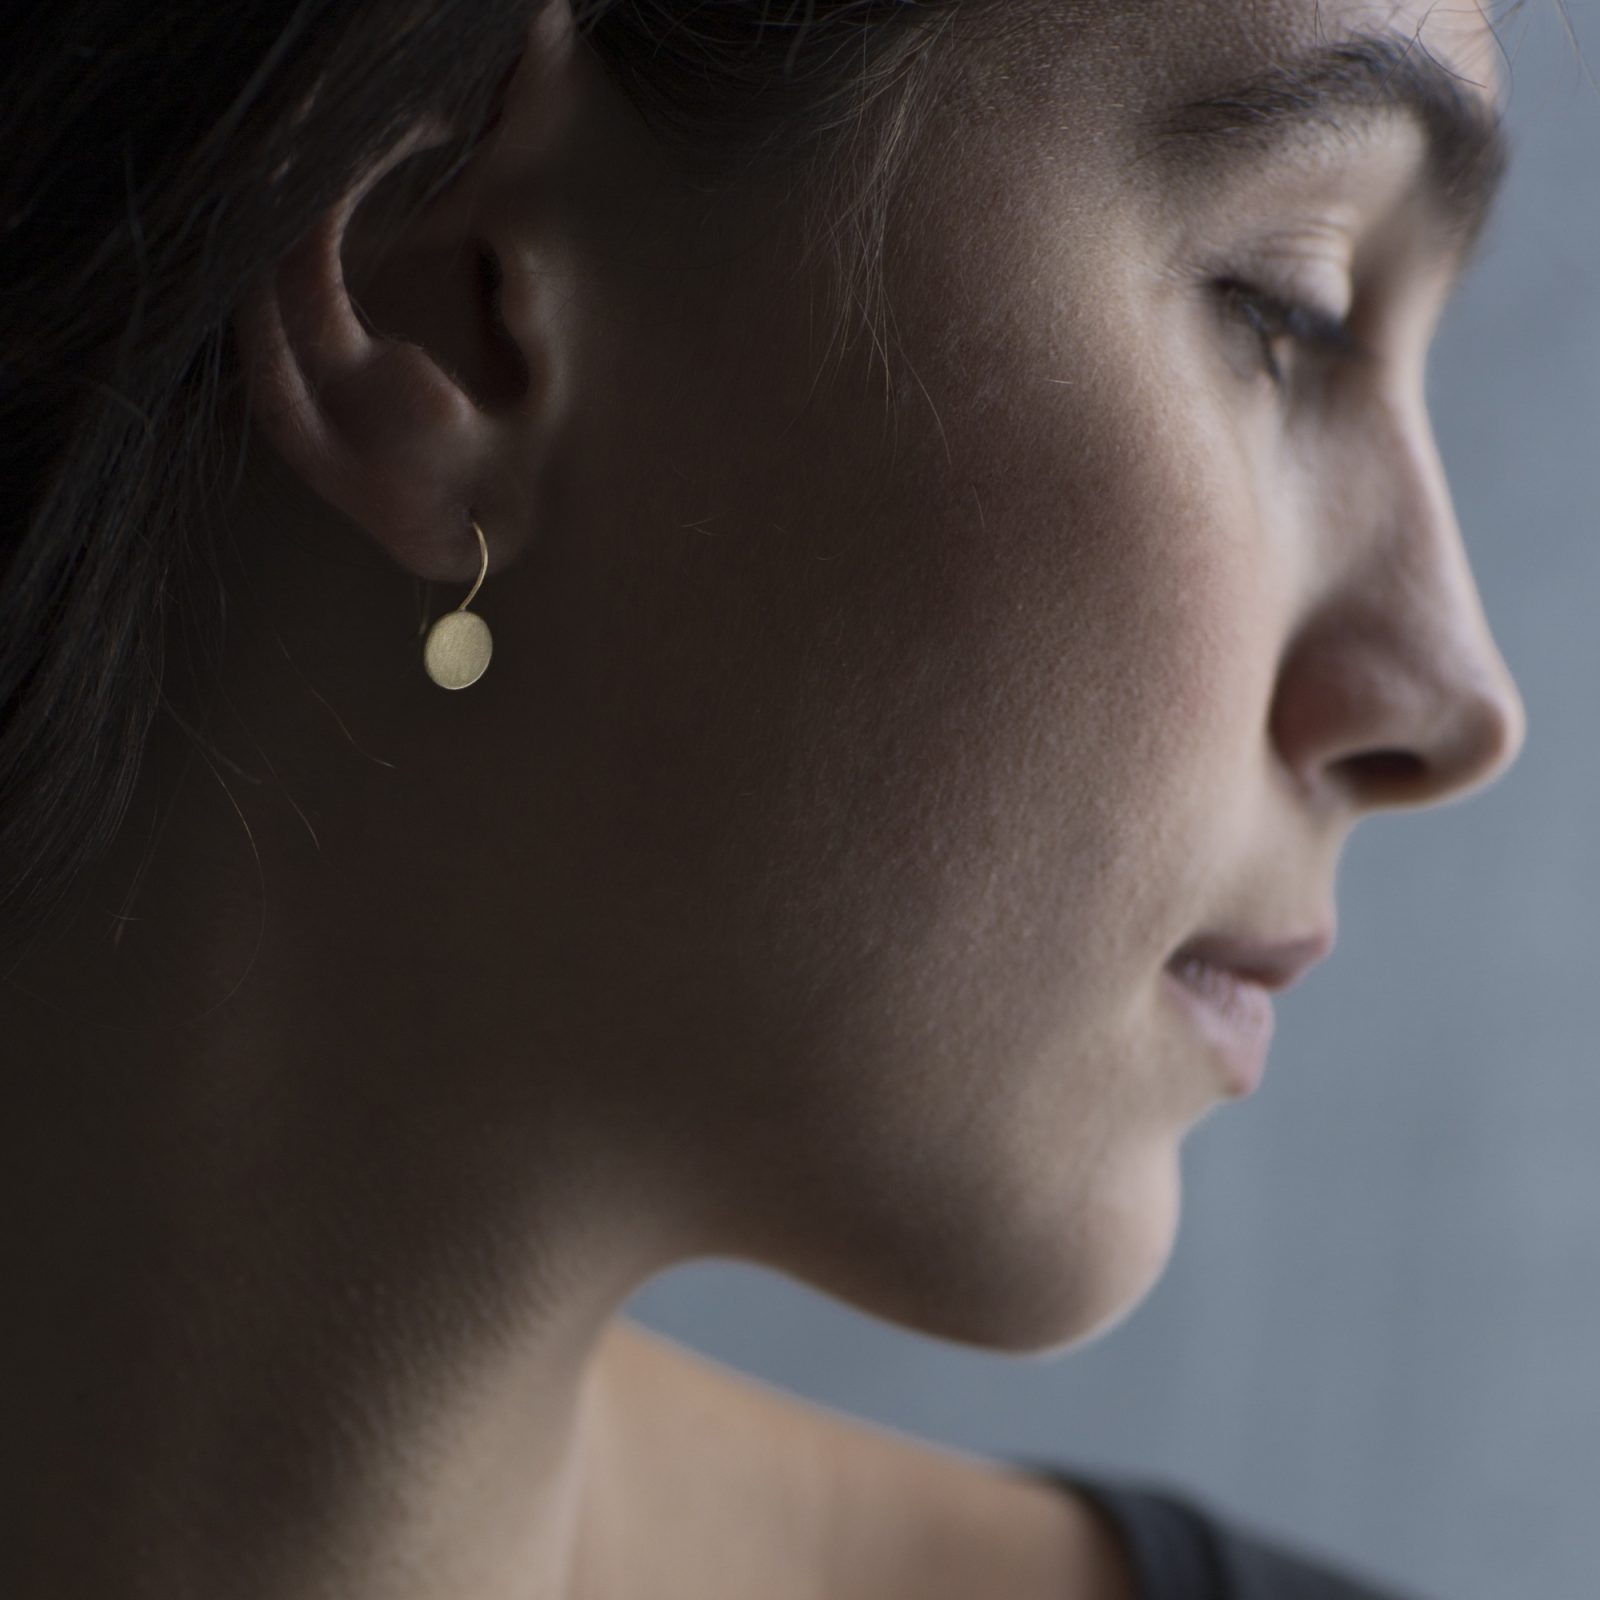 Sia Taylor KE15 Y Yellow Gold 8mm Moon Drop Earring M